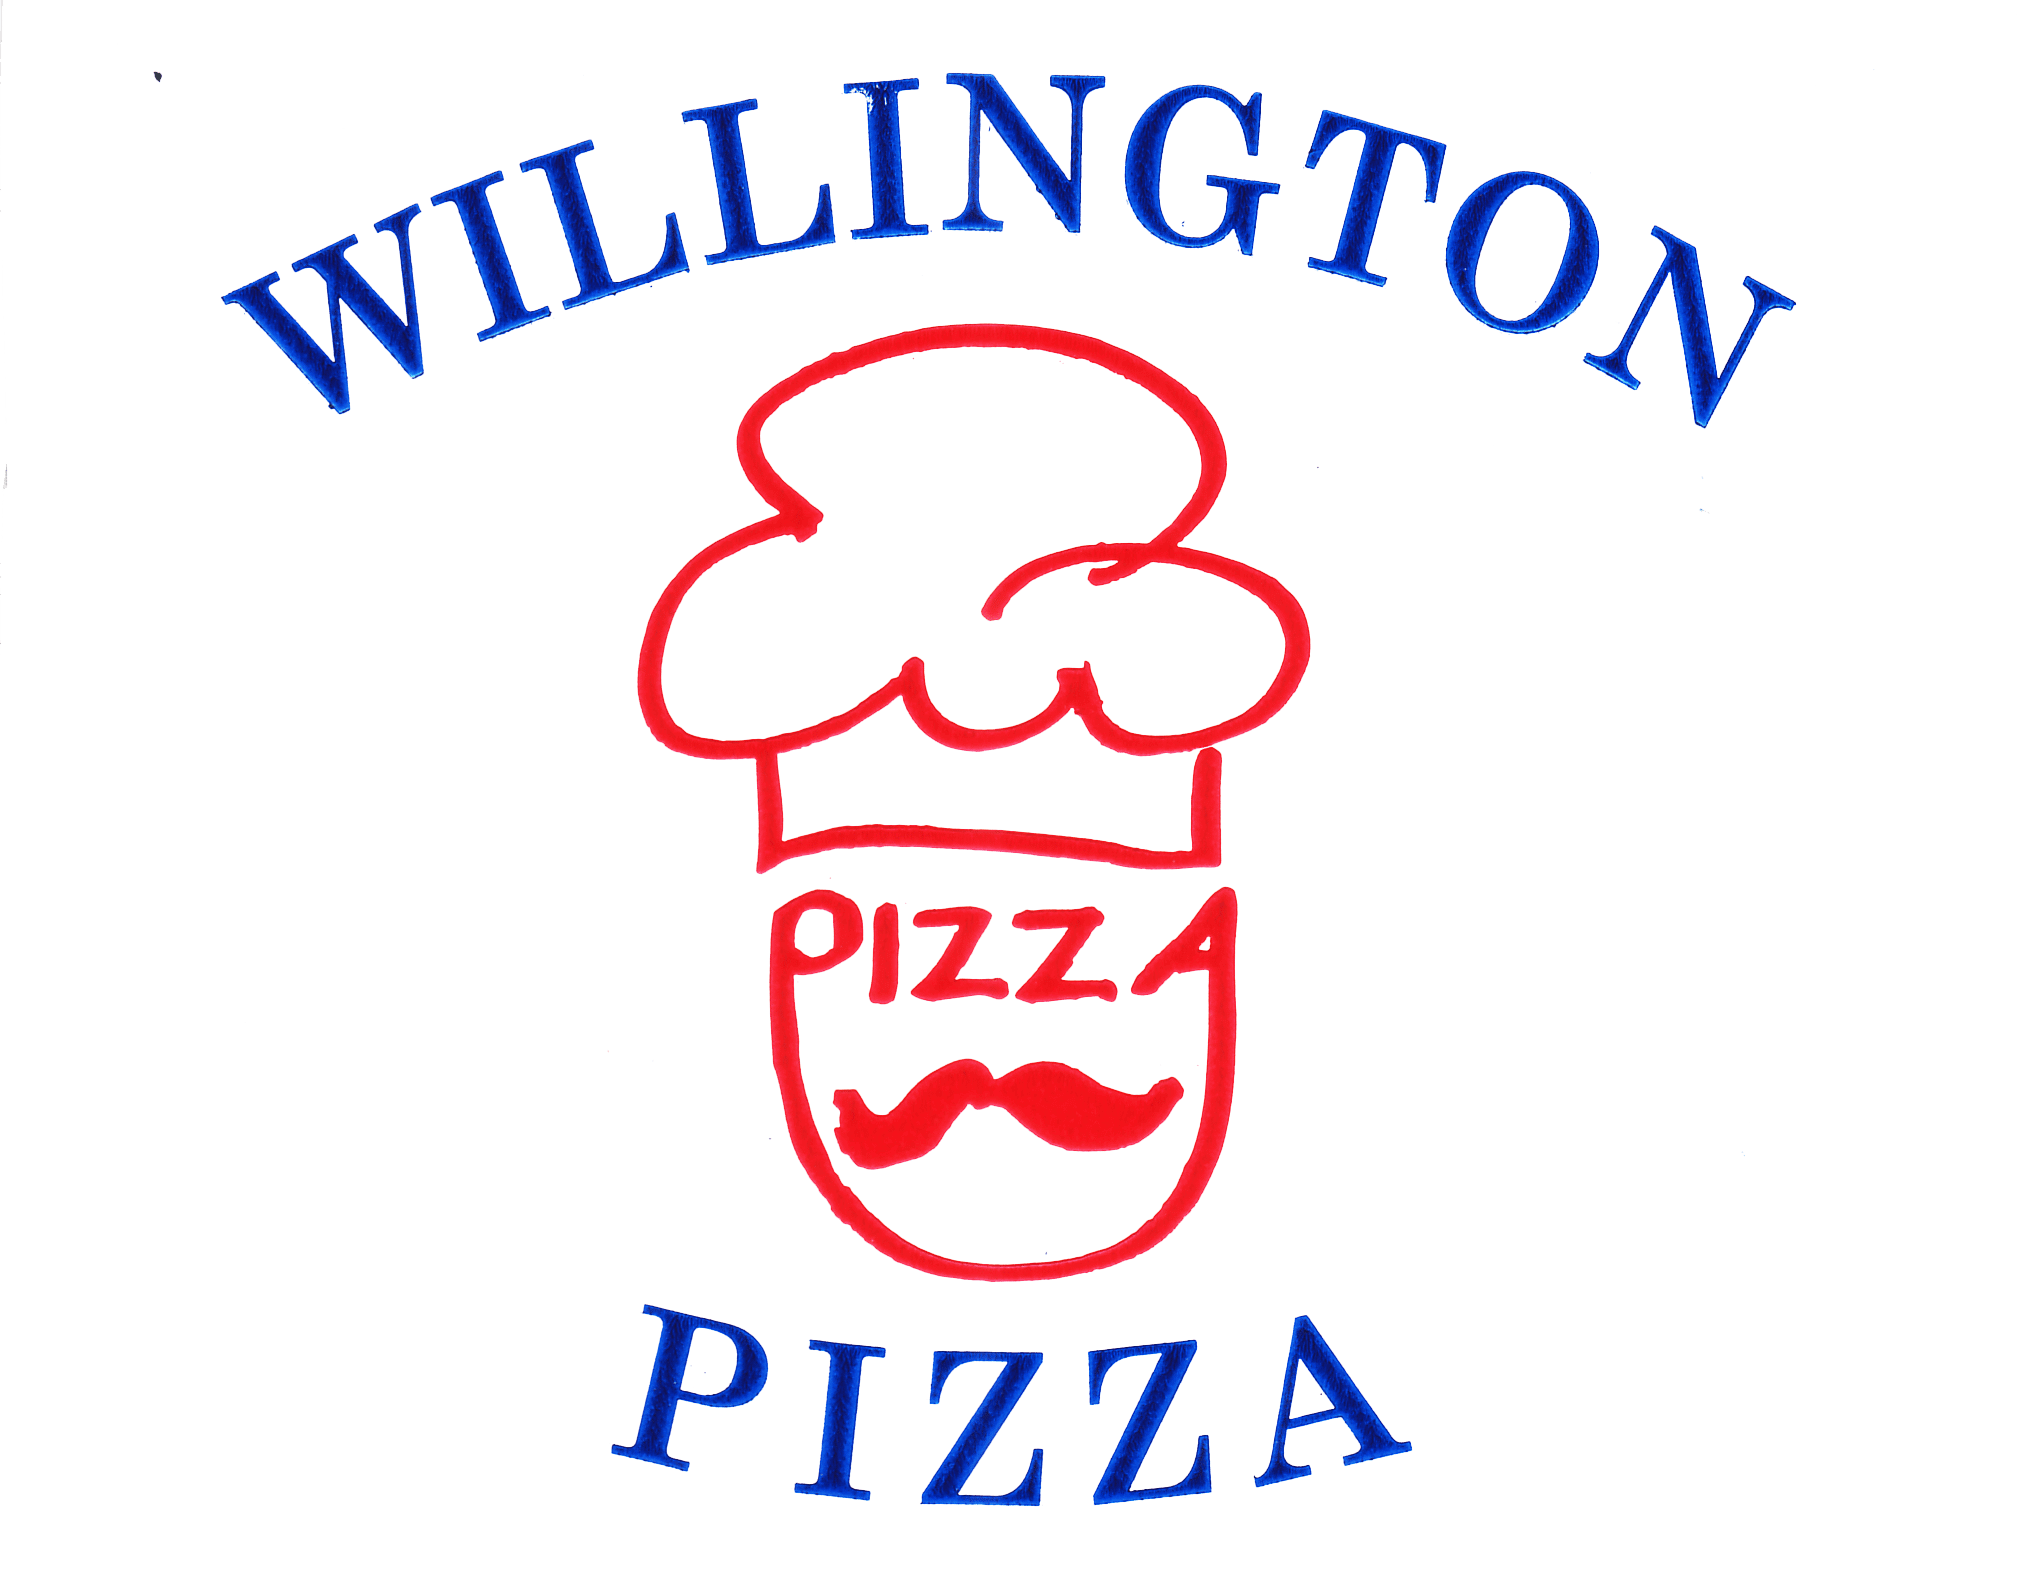 Willington Pizza